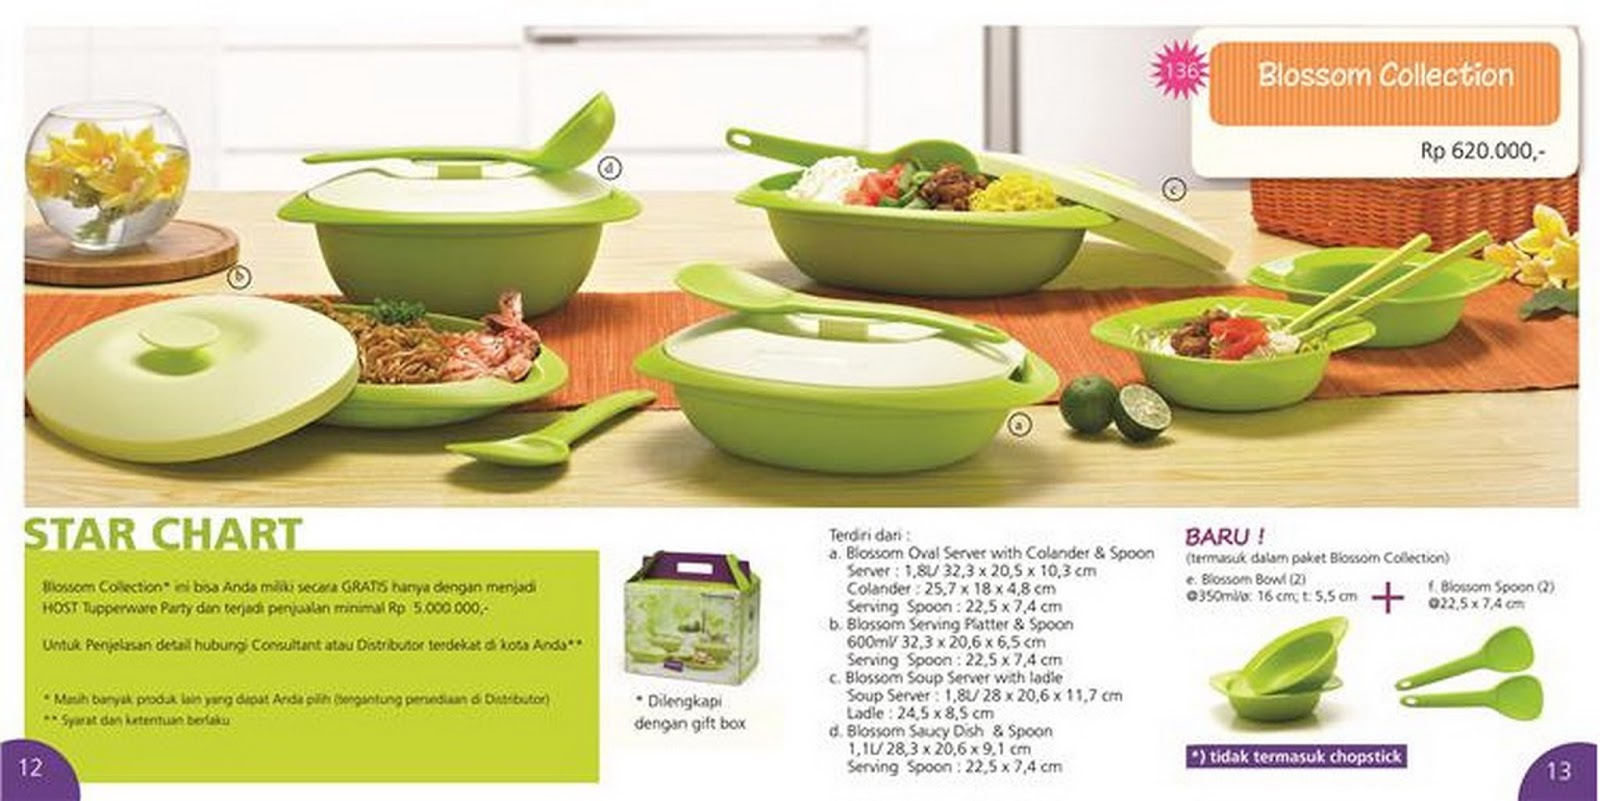 Tupperware Promo Blossom Collection Free Tchef Fry Pan Rp 620000 Terdiri Dari